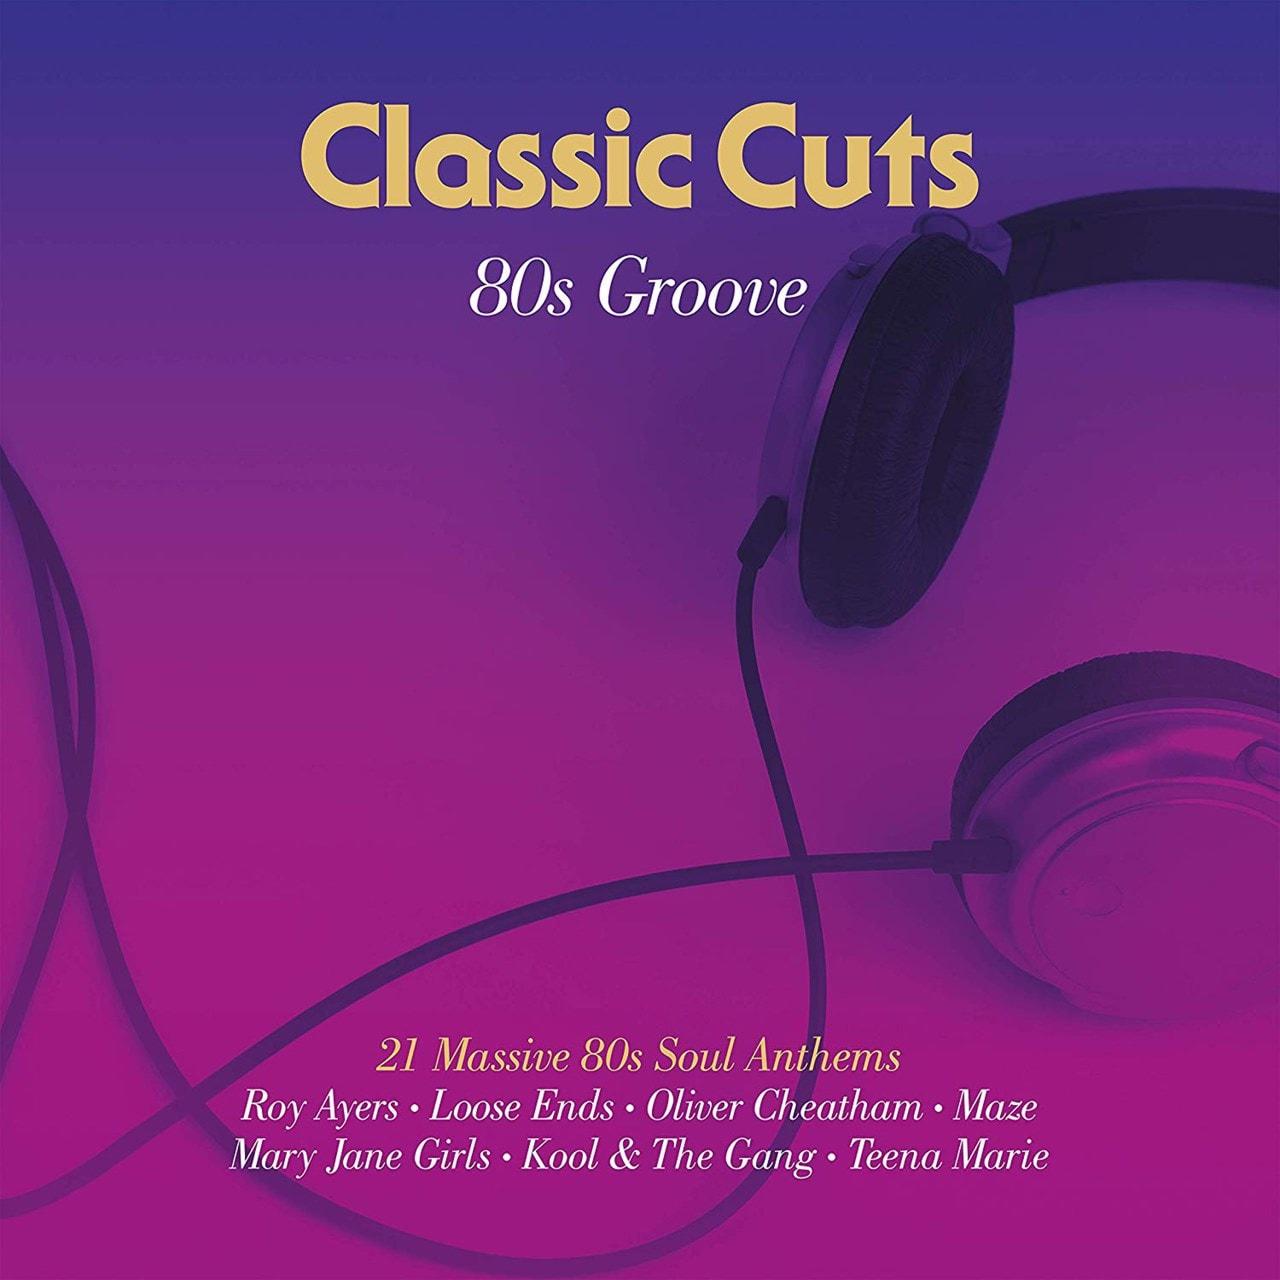 Classic Cuts: 80s Groove - 1